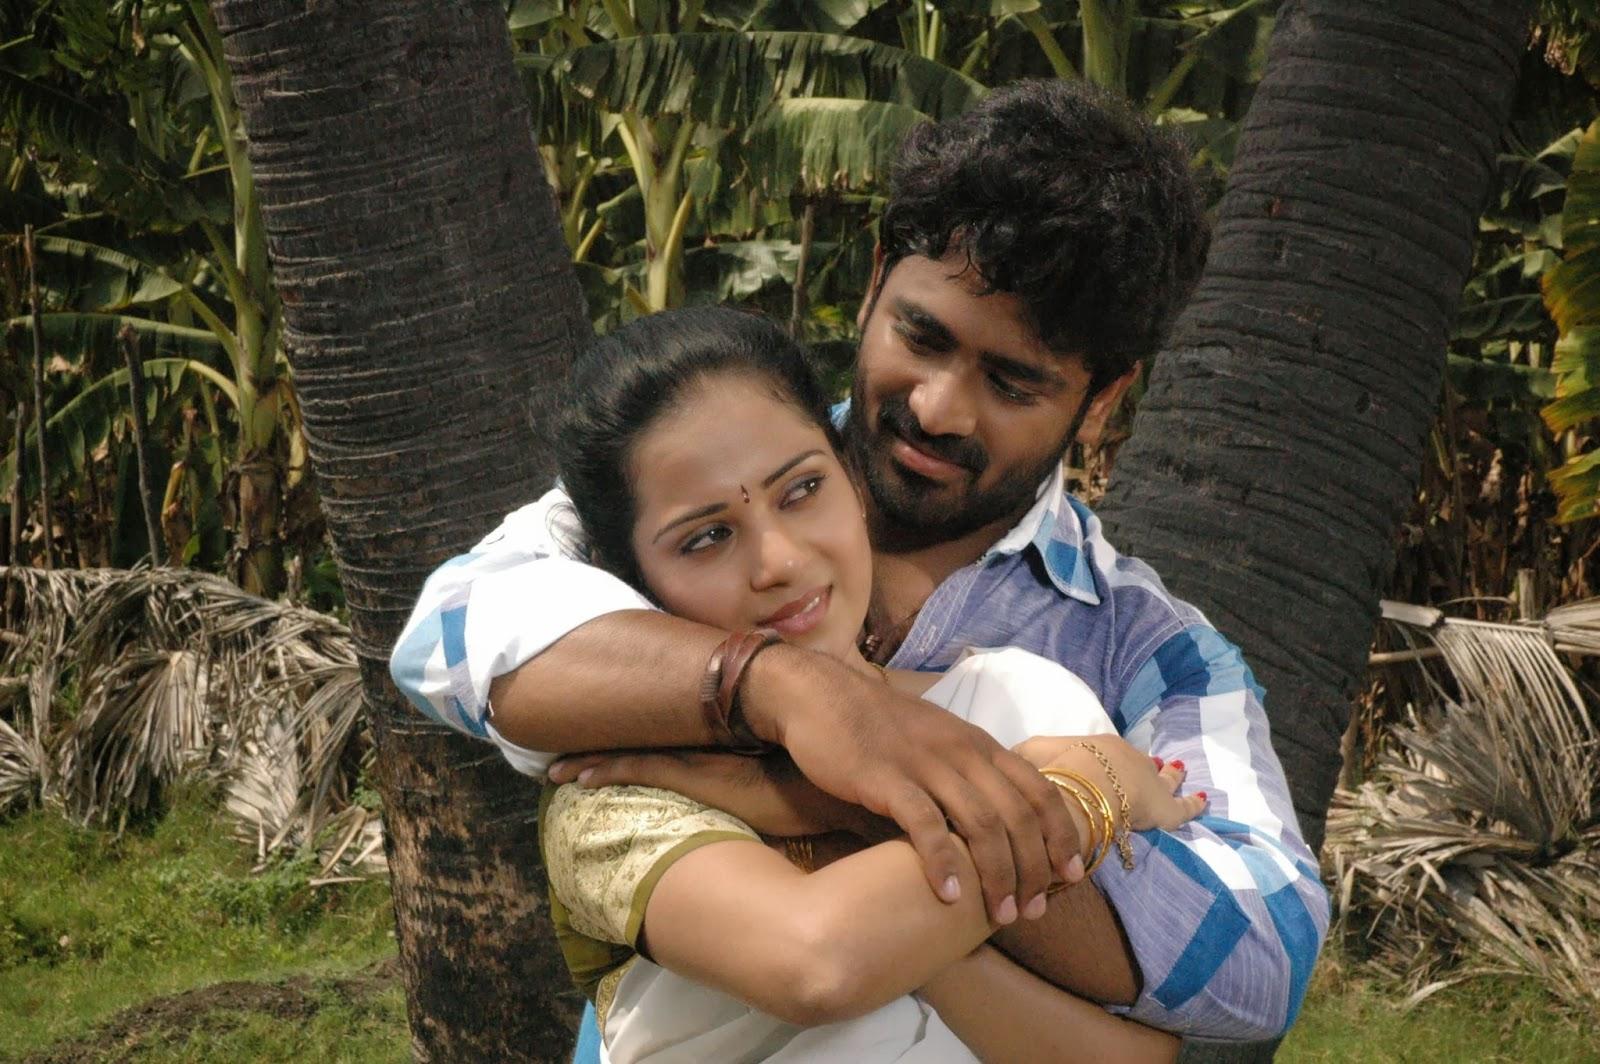 Muthu Hd Video Download 720p Movies [TOP] Muthu+Nagaram+Movie+Stills